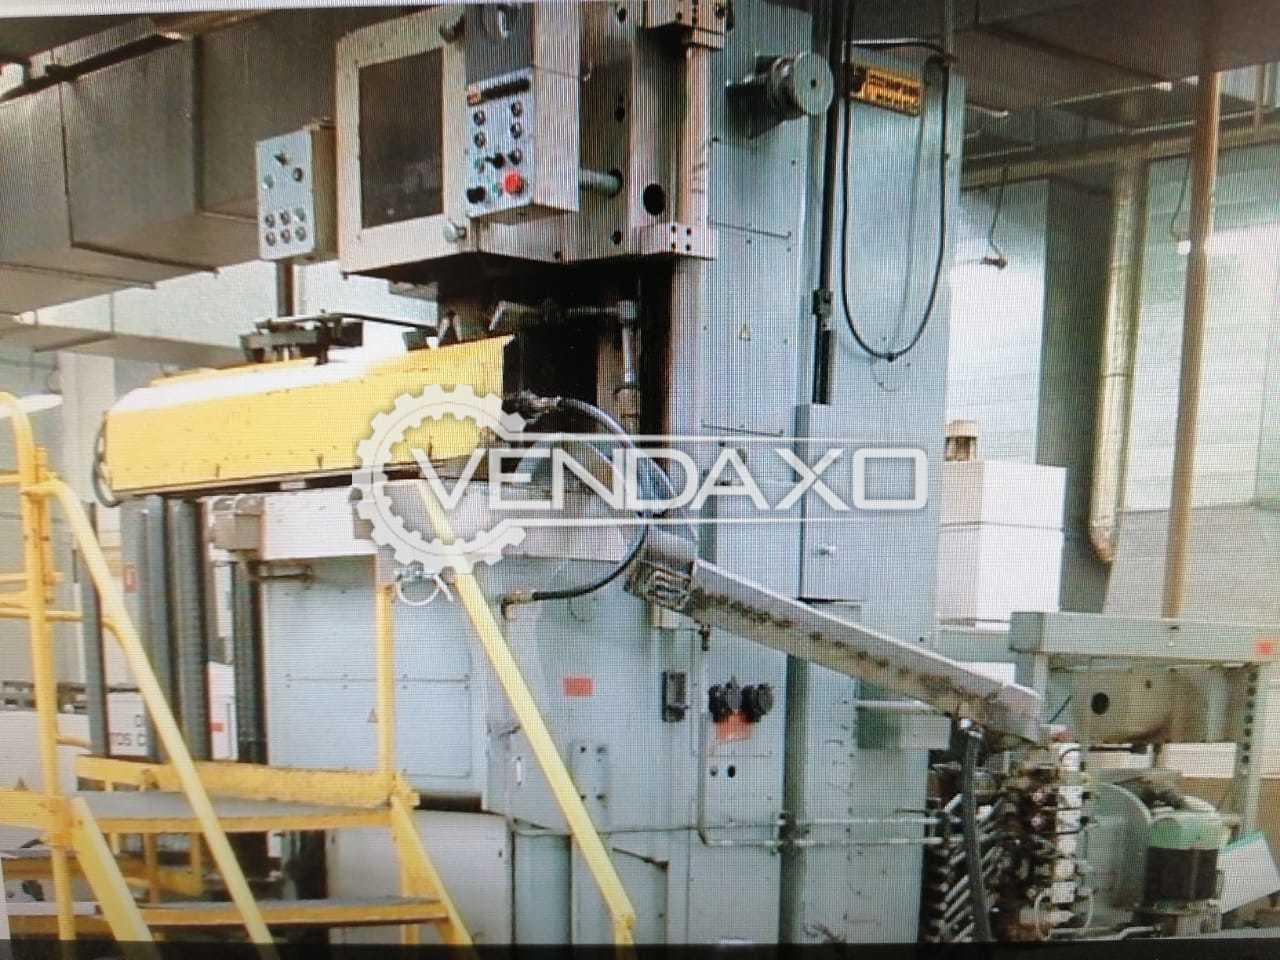 Stanko Kirov MP76 33-001-149 Broaching Machine - Table Size - 750 x 280 mm